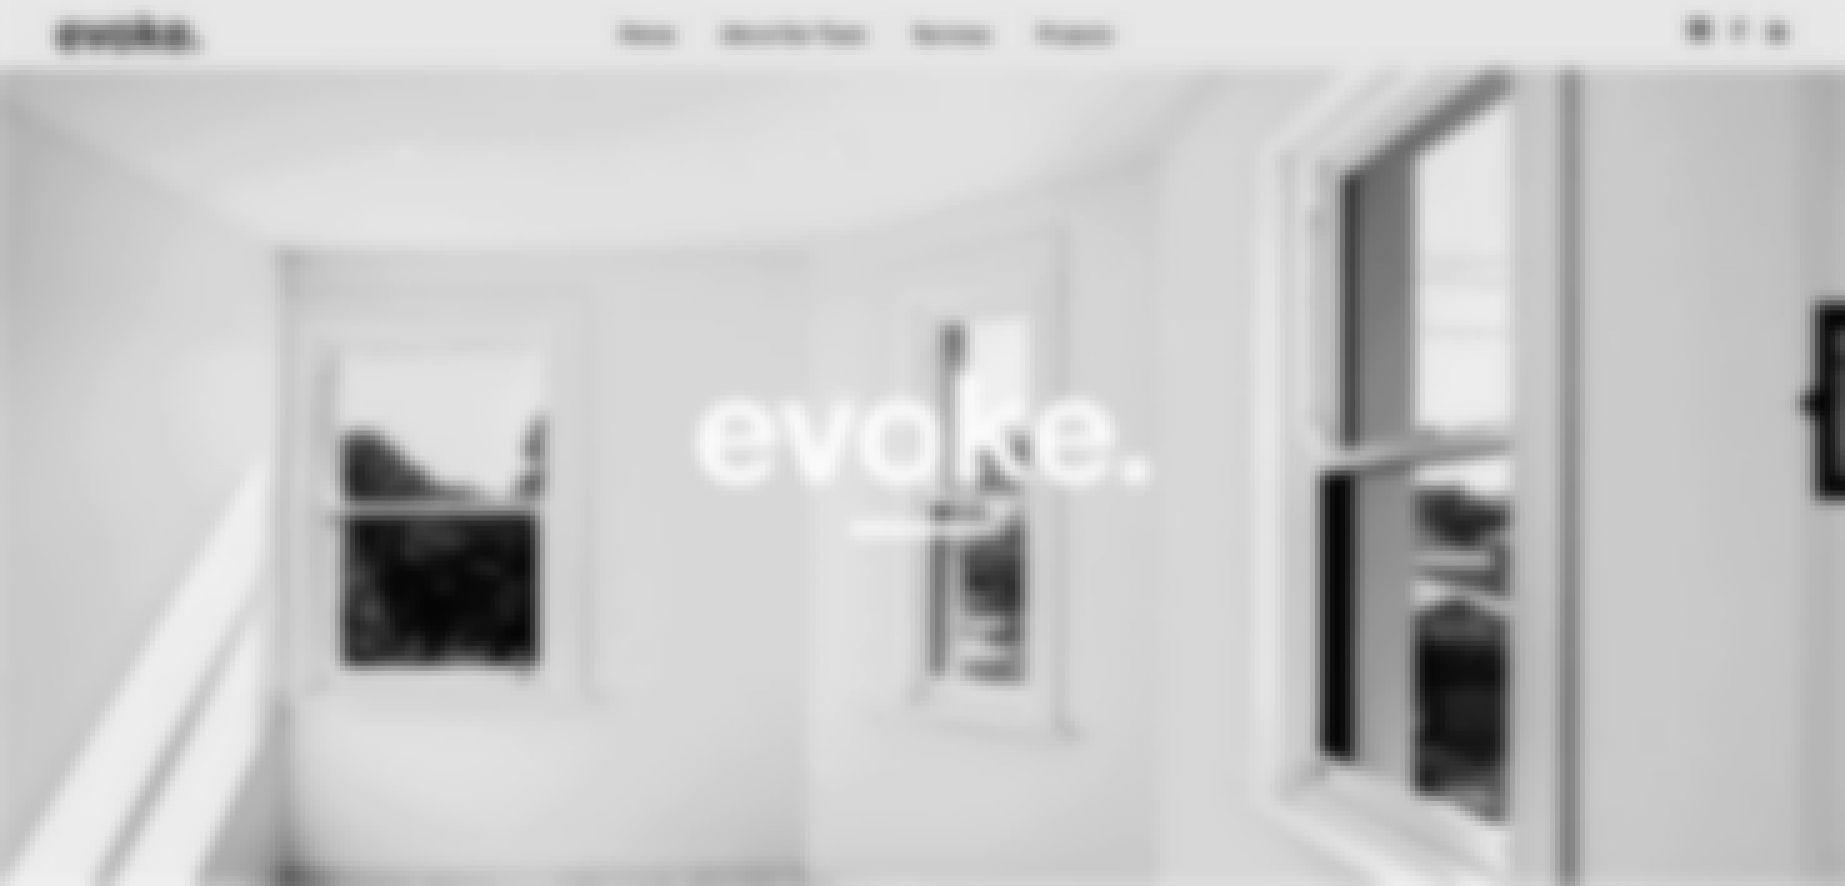 evoke property